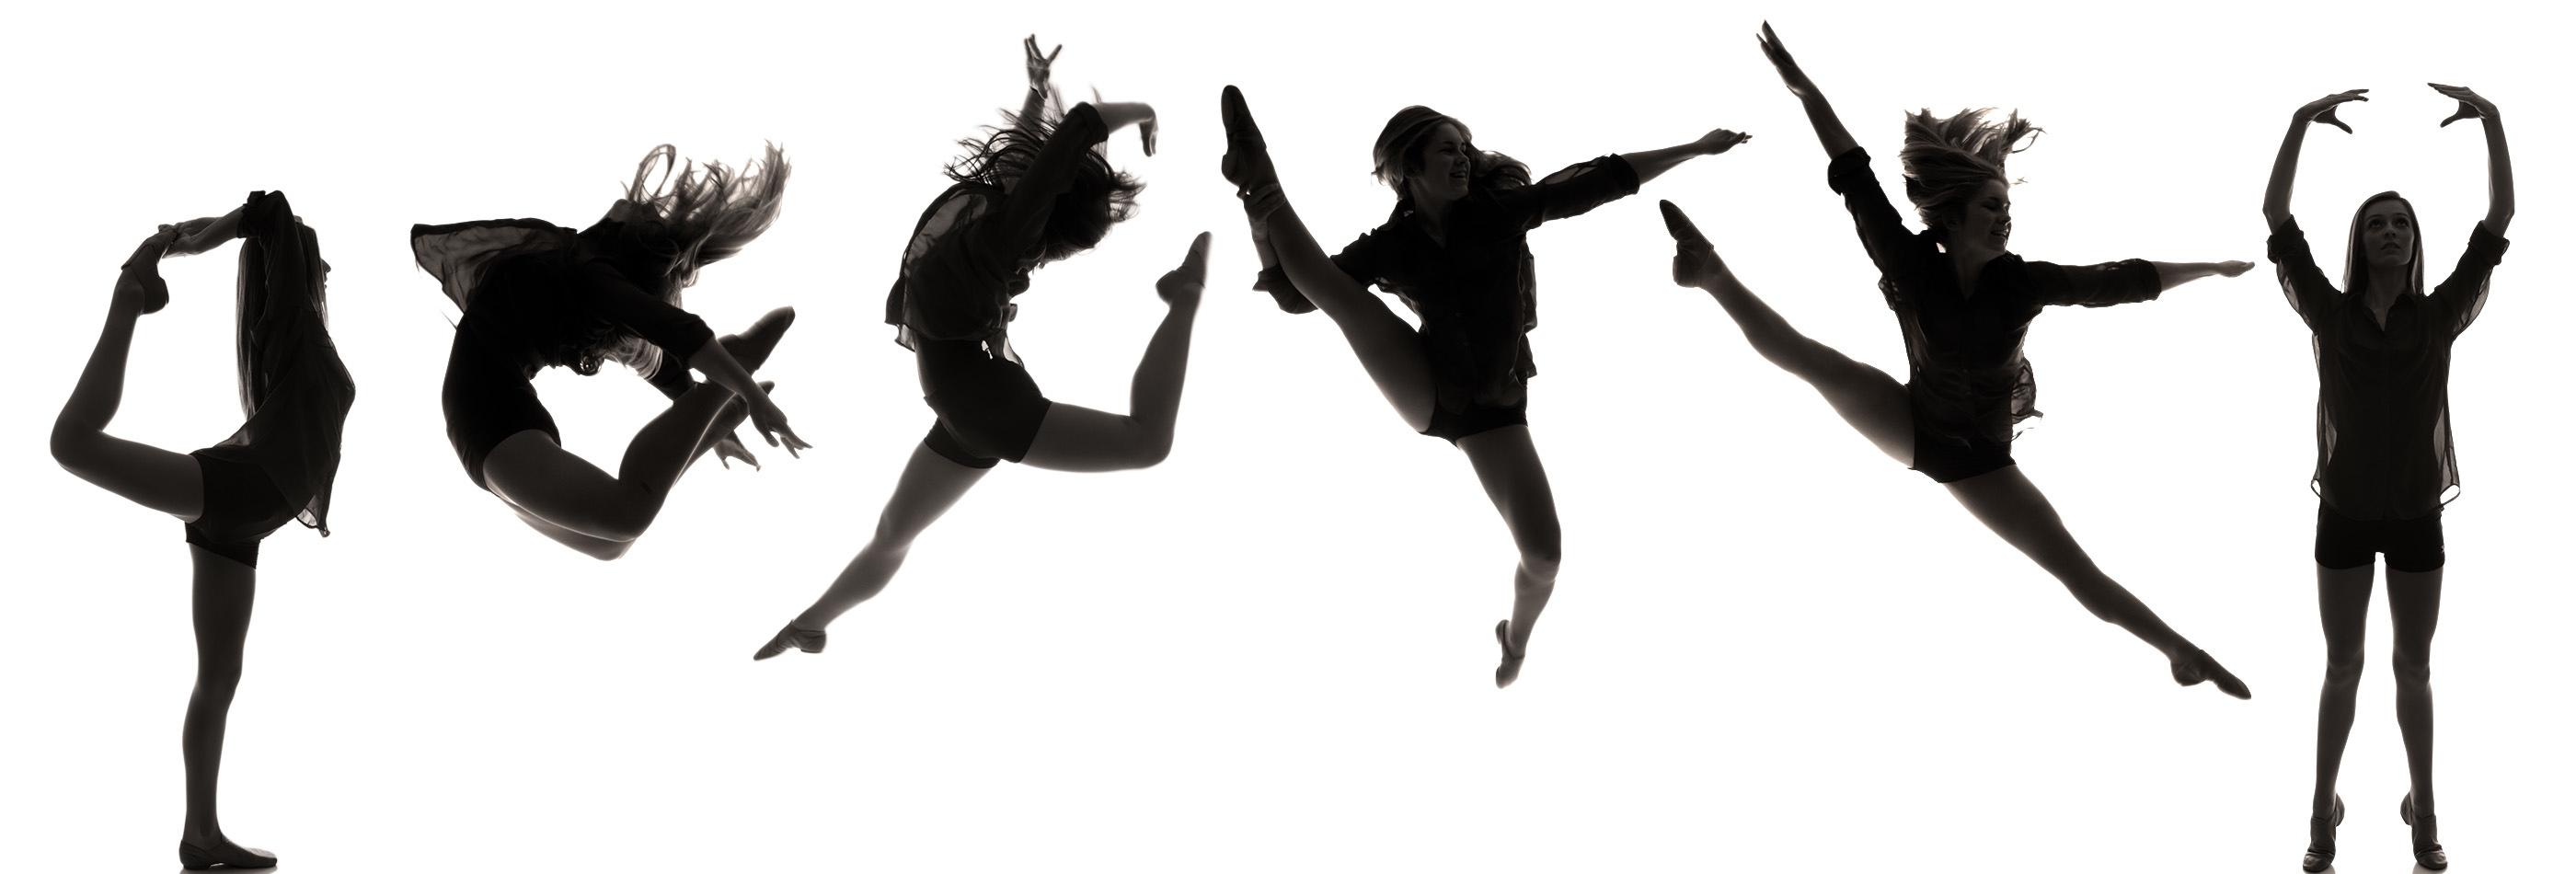 Go Back Images For Dancer Silhouette Leap